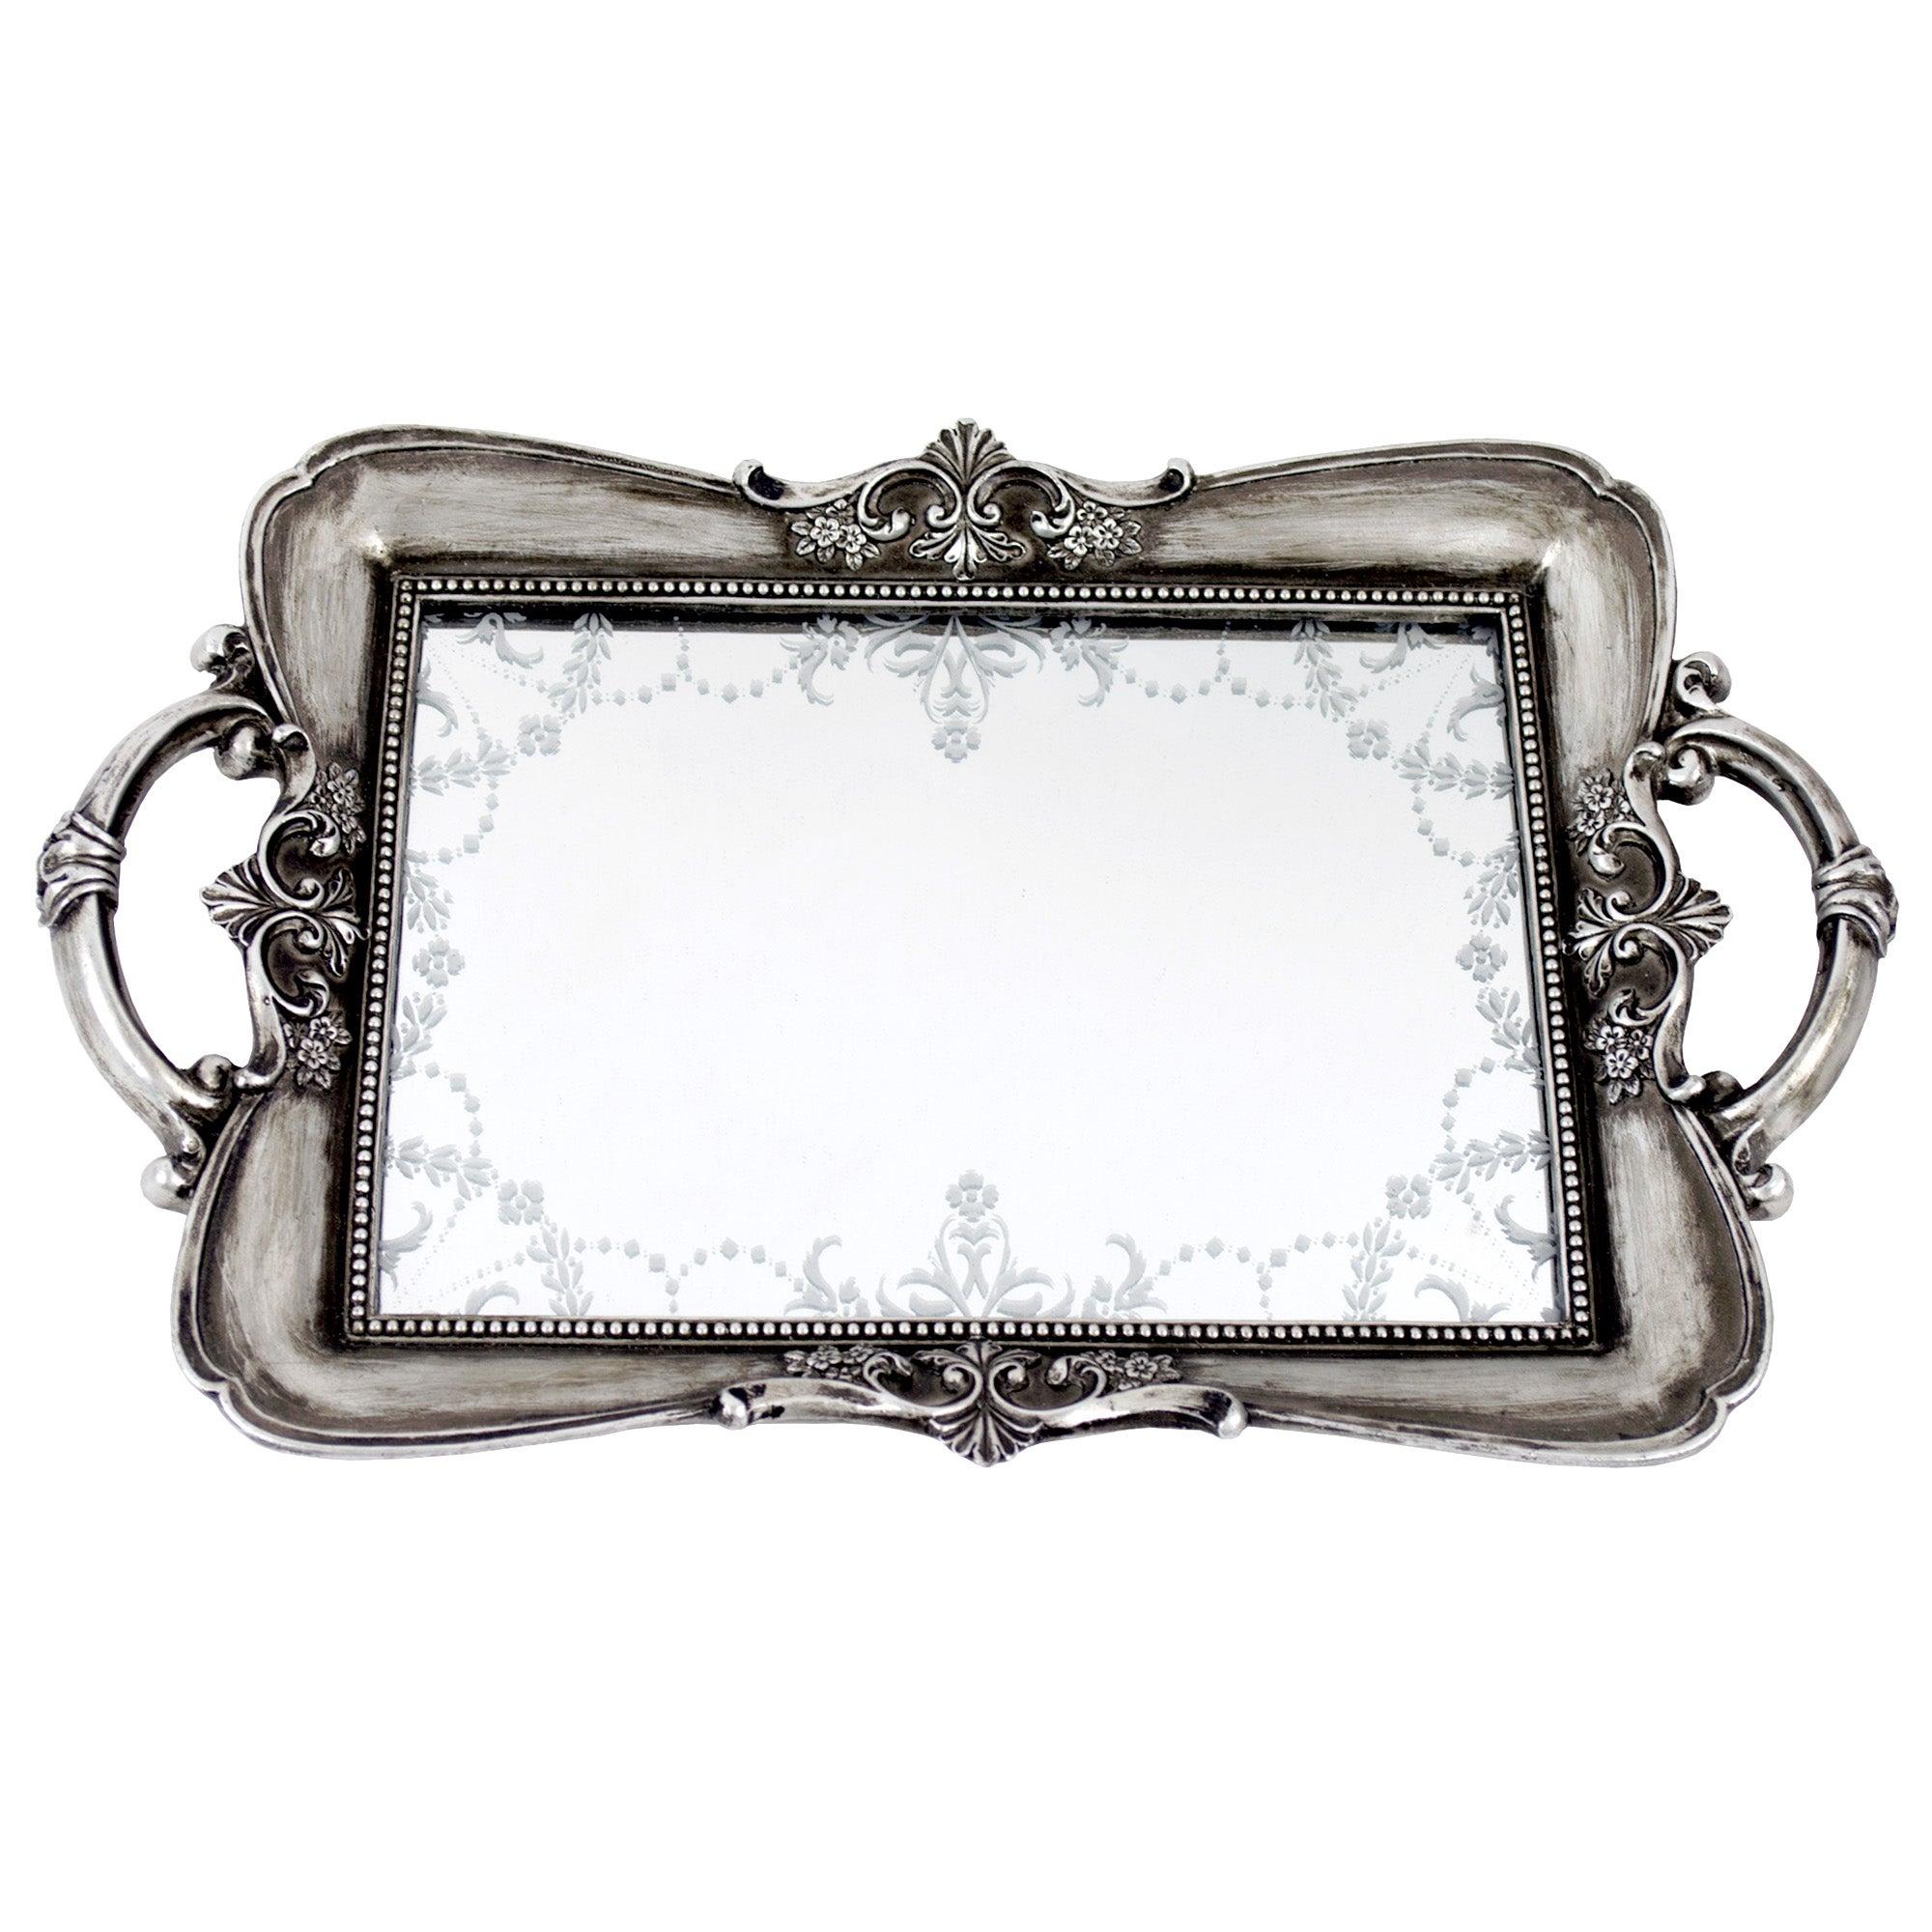 Maison Chic Venetian Mirror Tray Silver